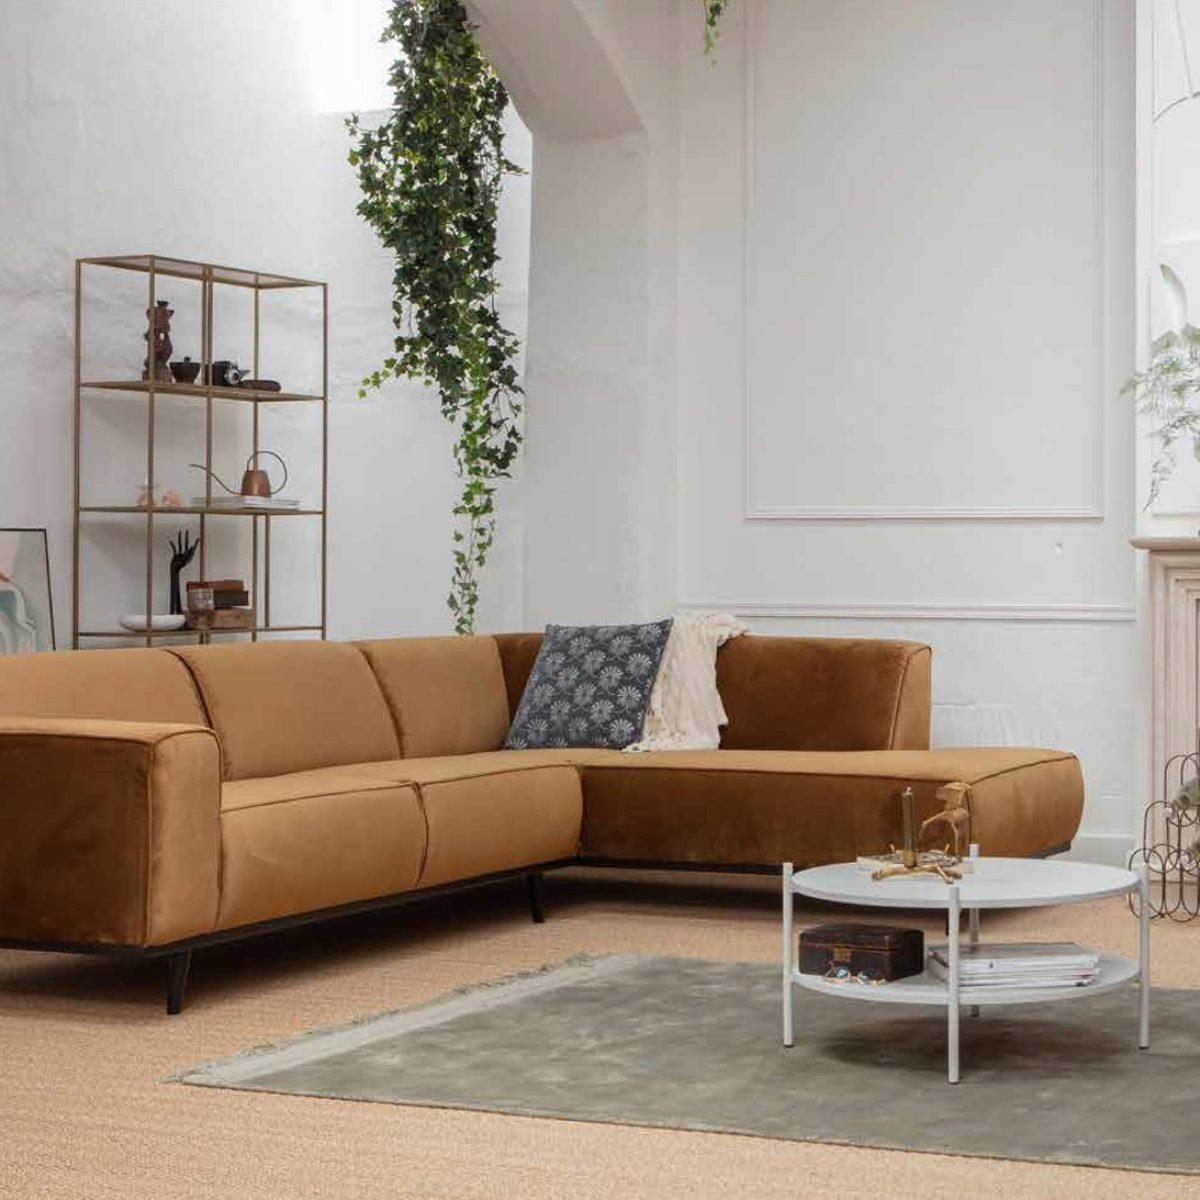 Bepure statement sofa 02